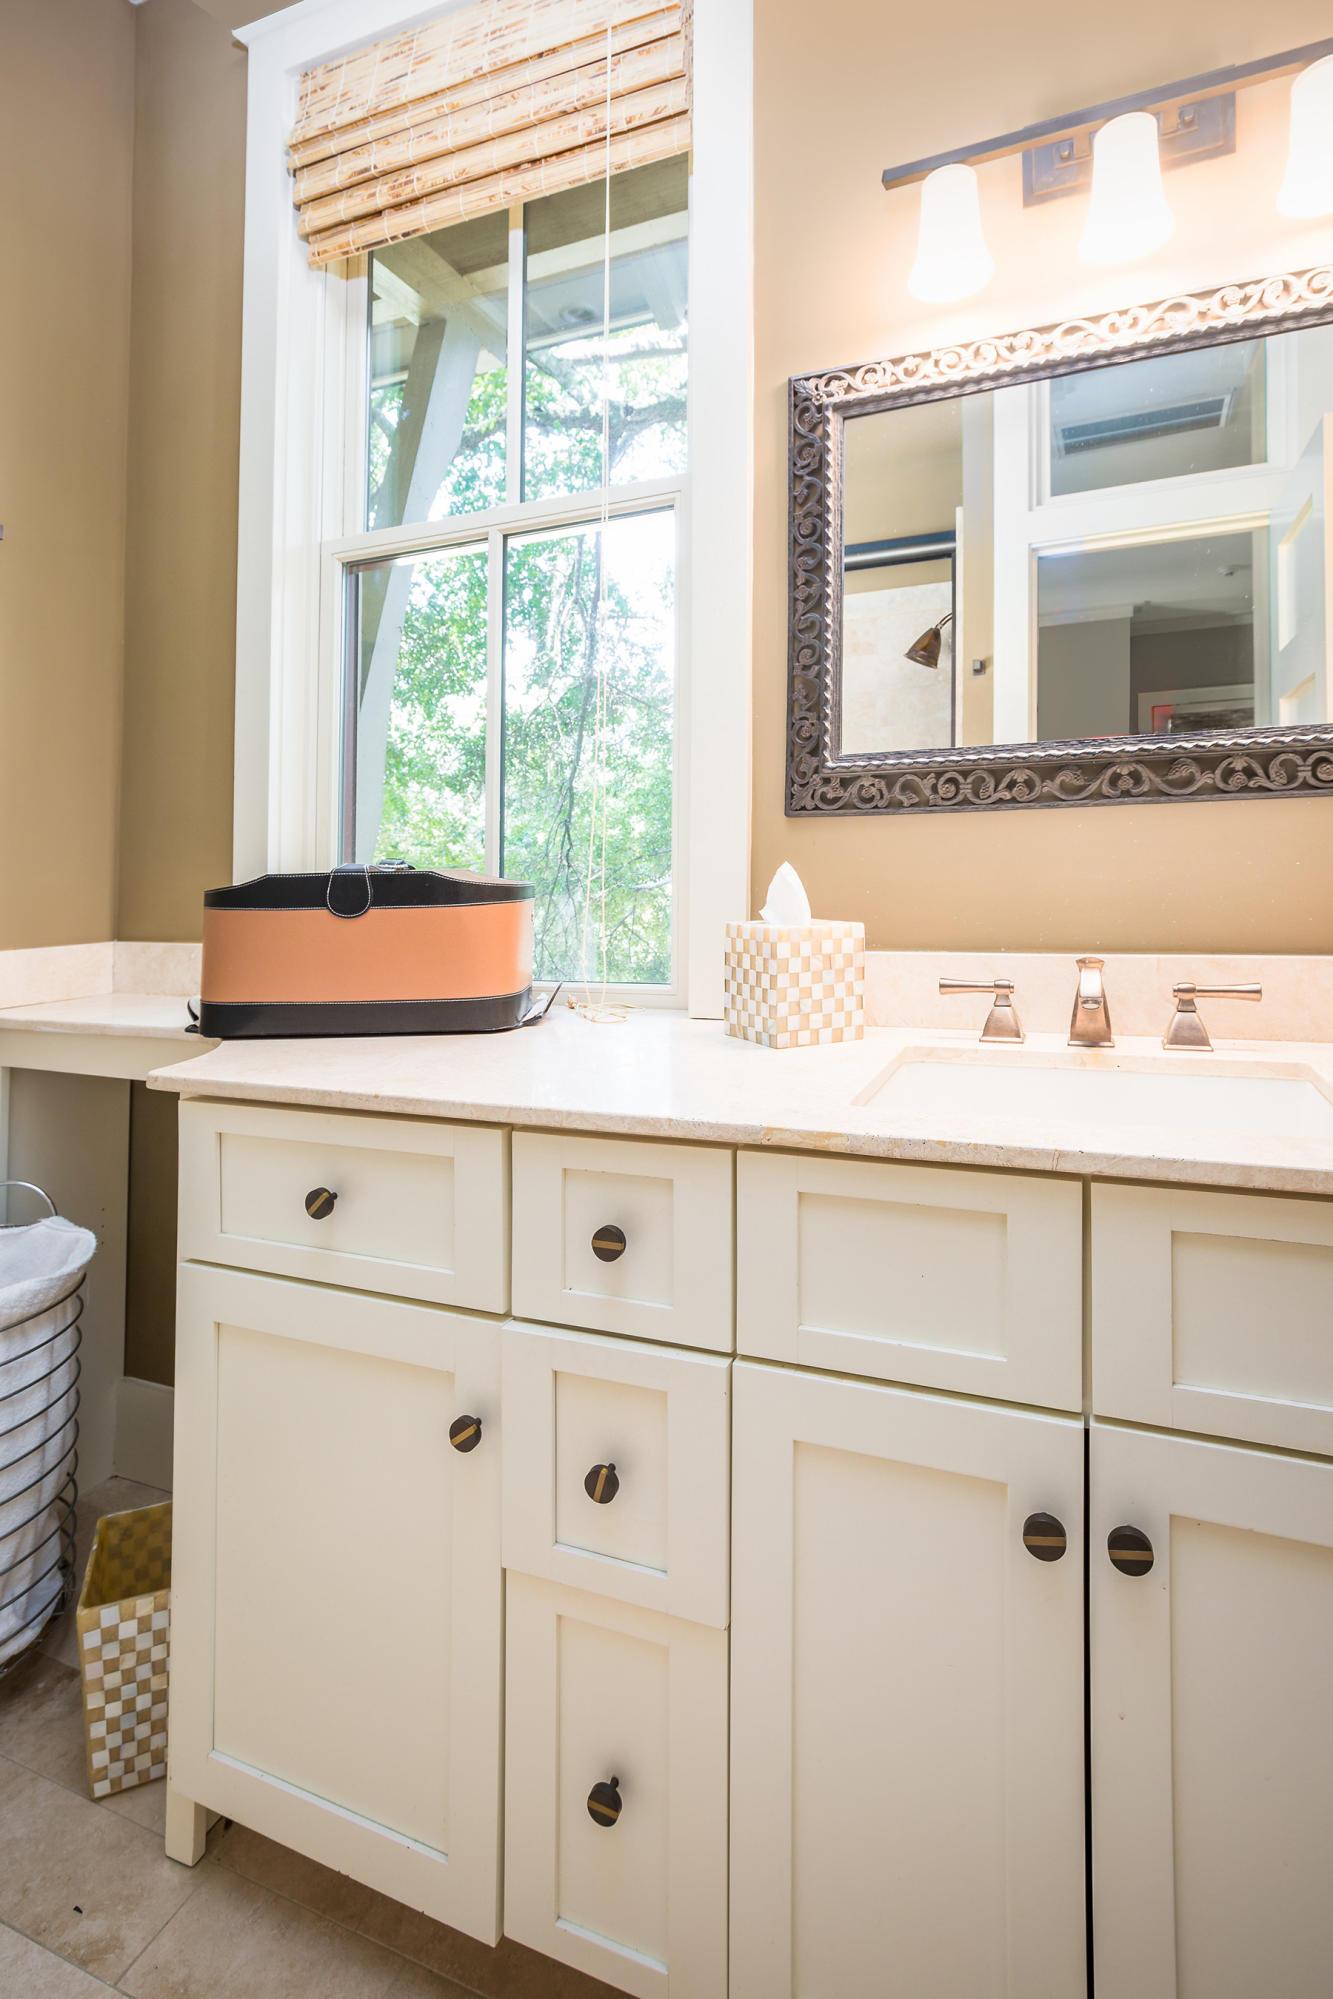 Ellis Oaks Homes For Sale - 672 Ellis Oak, Charleston, SC - 36